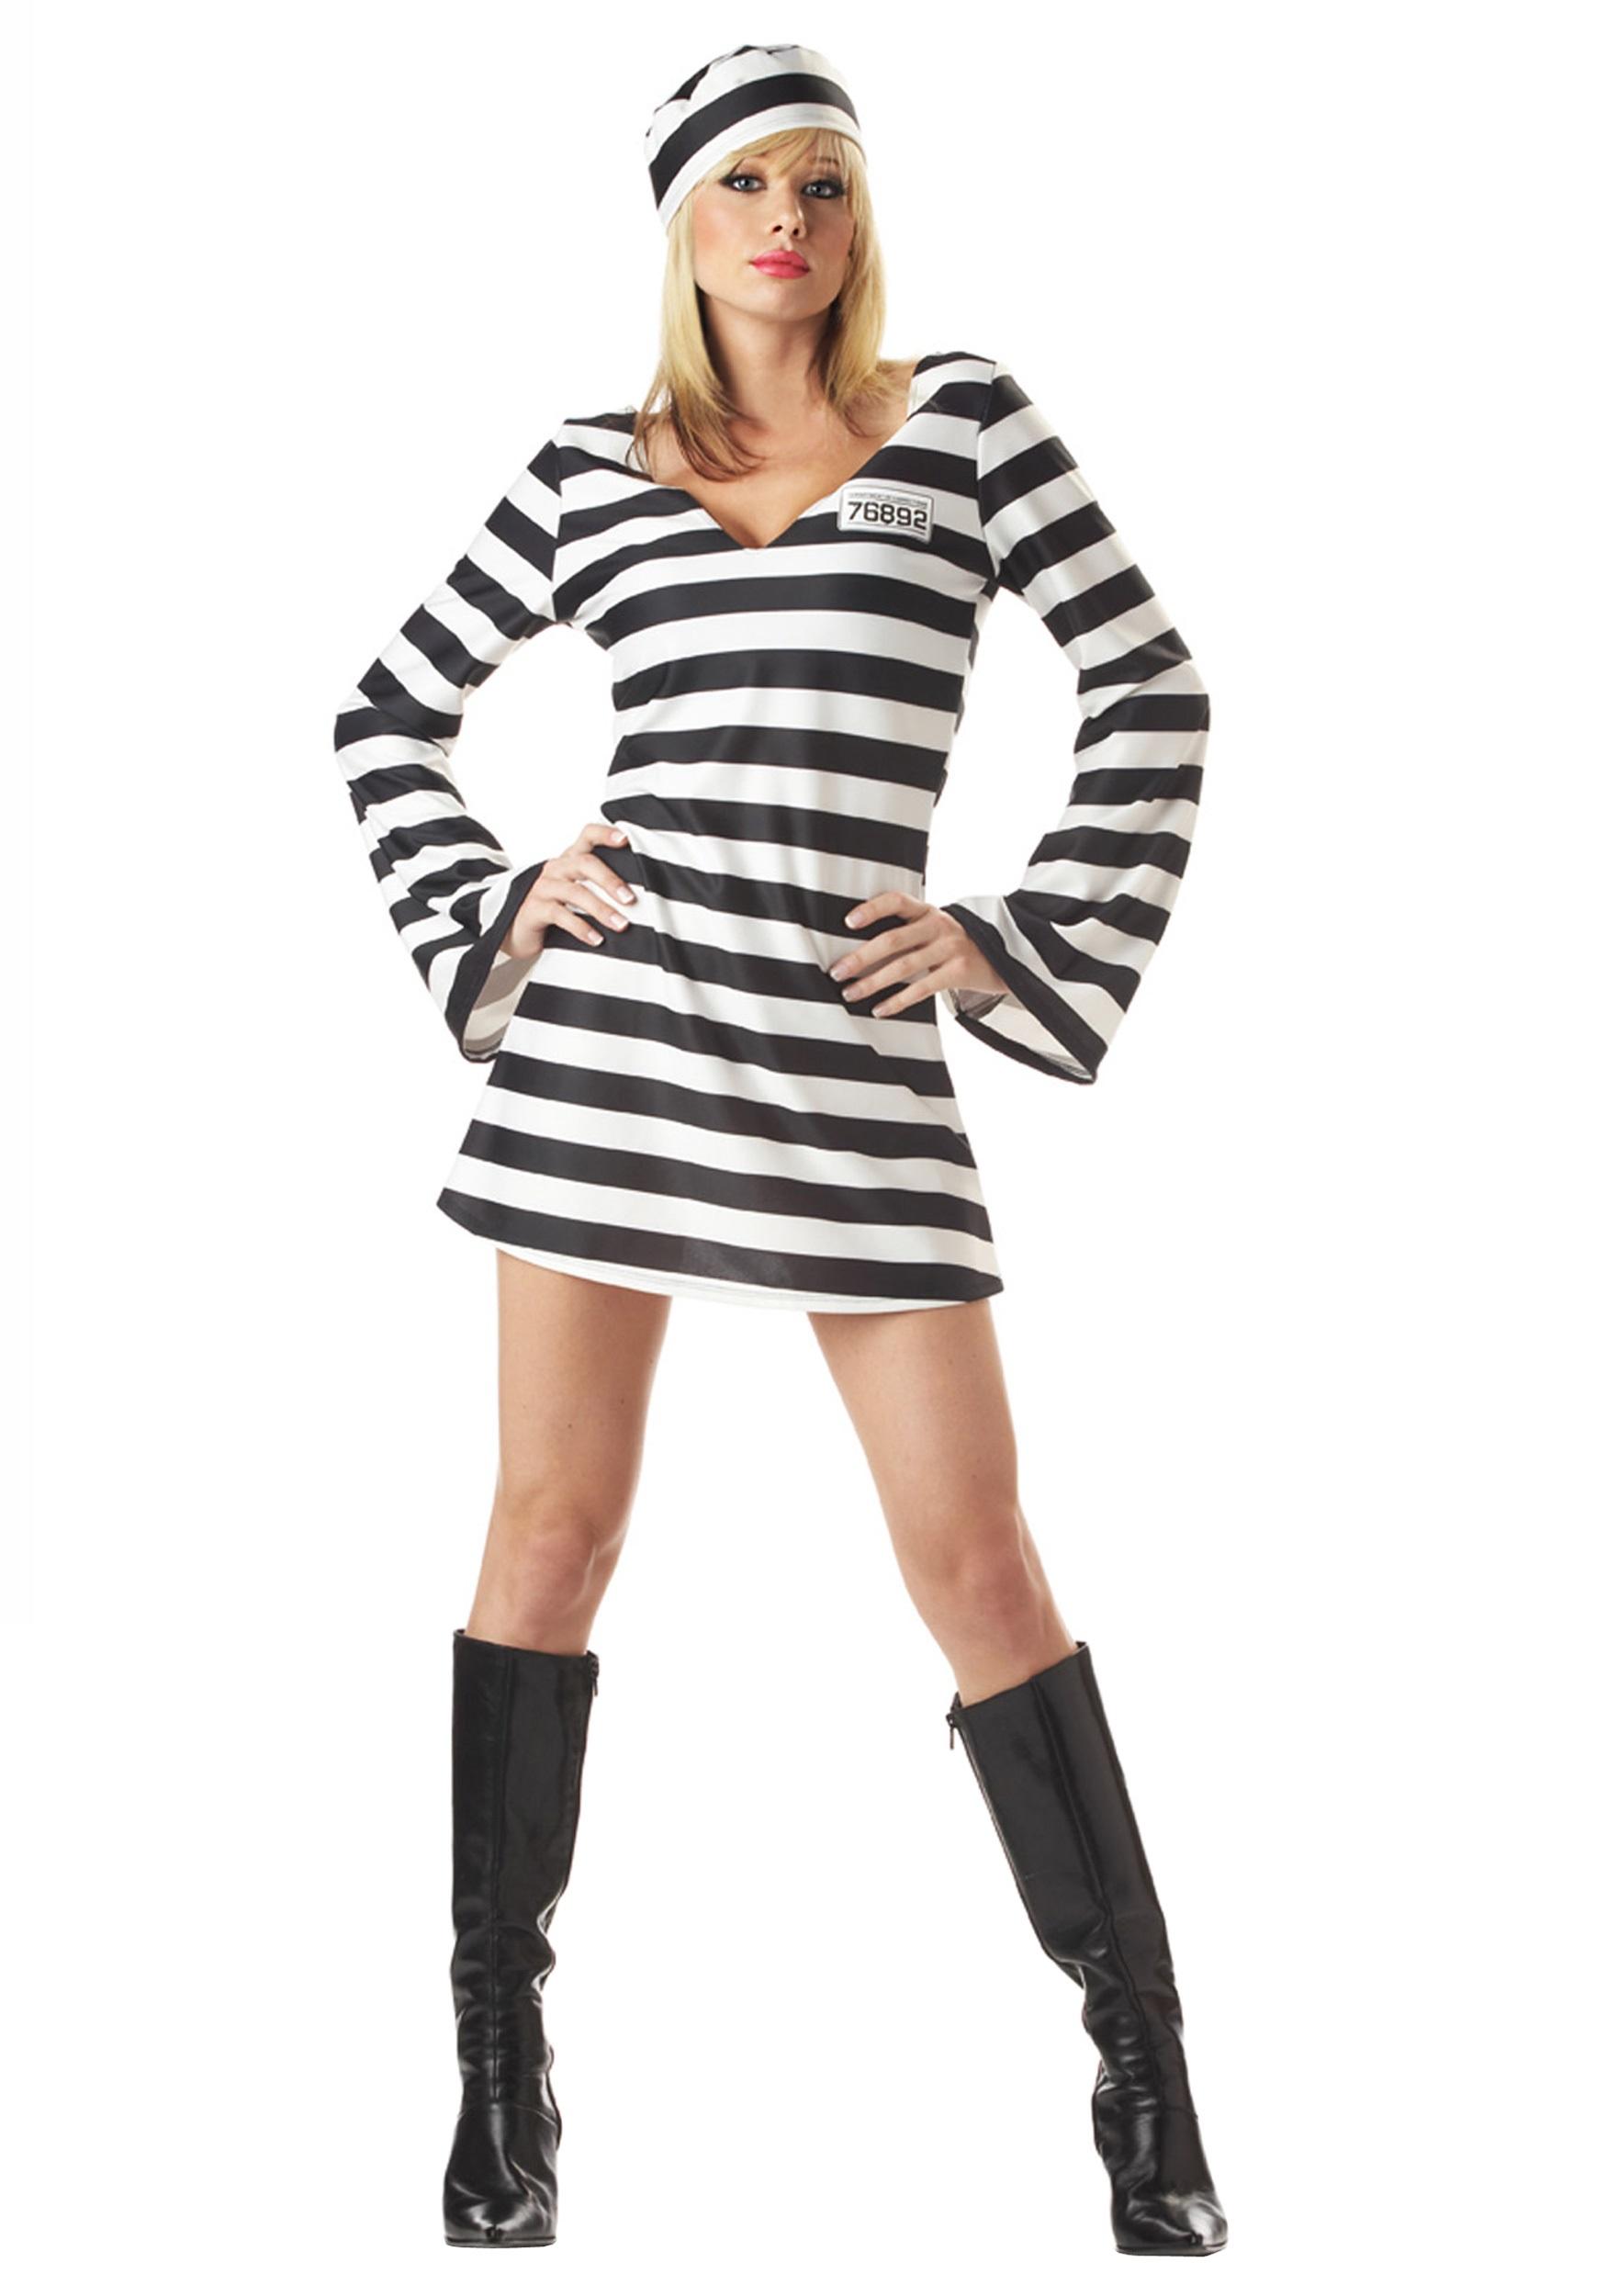 Sexy jail costumes